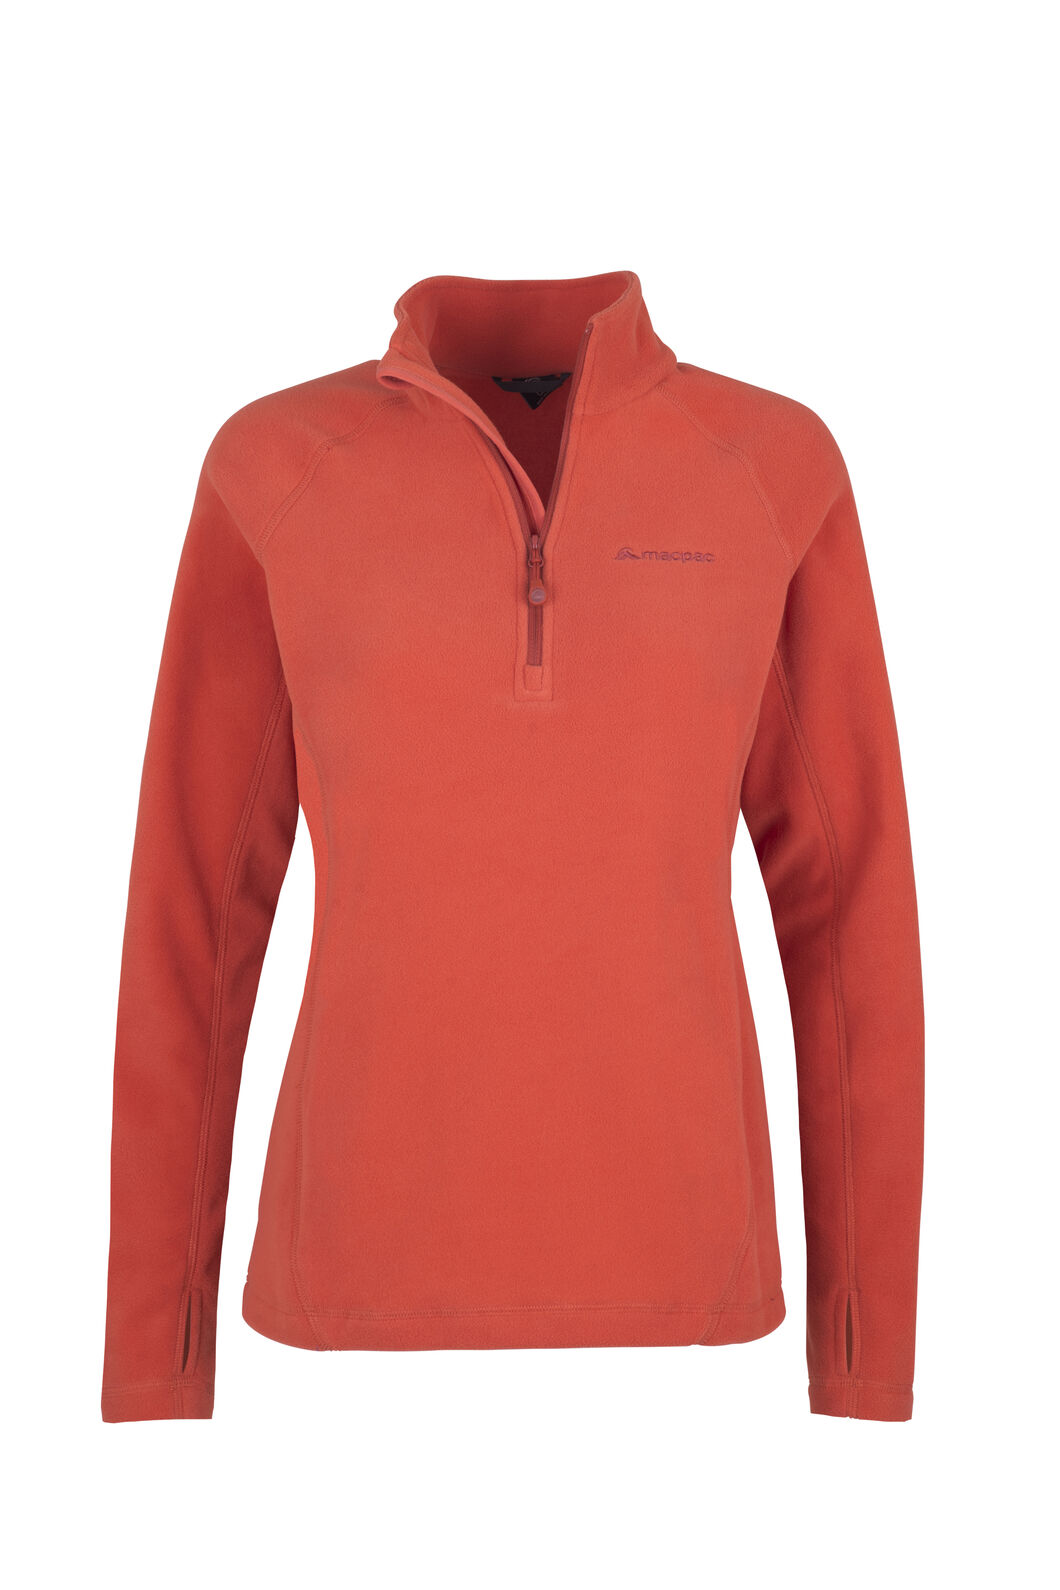 Macpac Tui Fleece Pullover - Women's, Chilli, hi-res